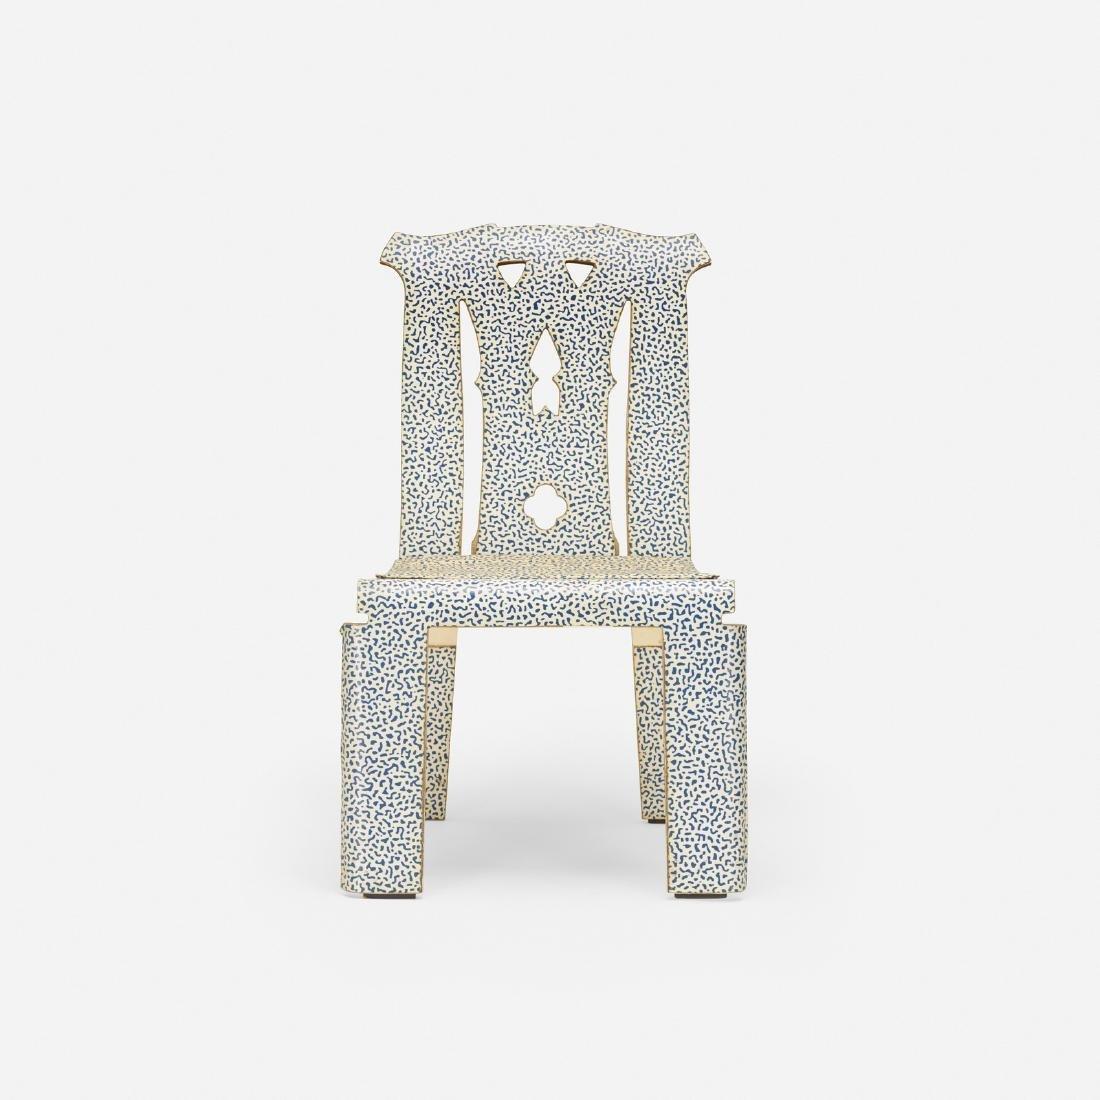 Robert Venturi, Brown, prototype Chippendale chair